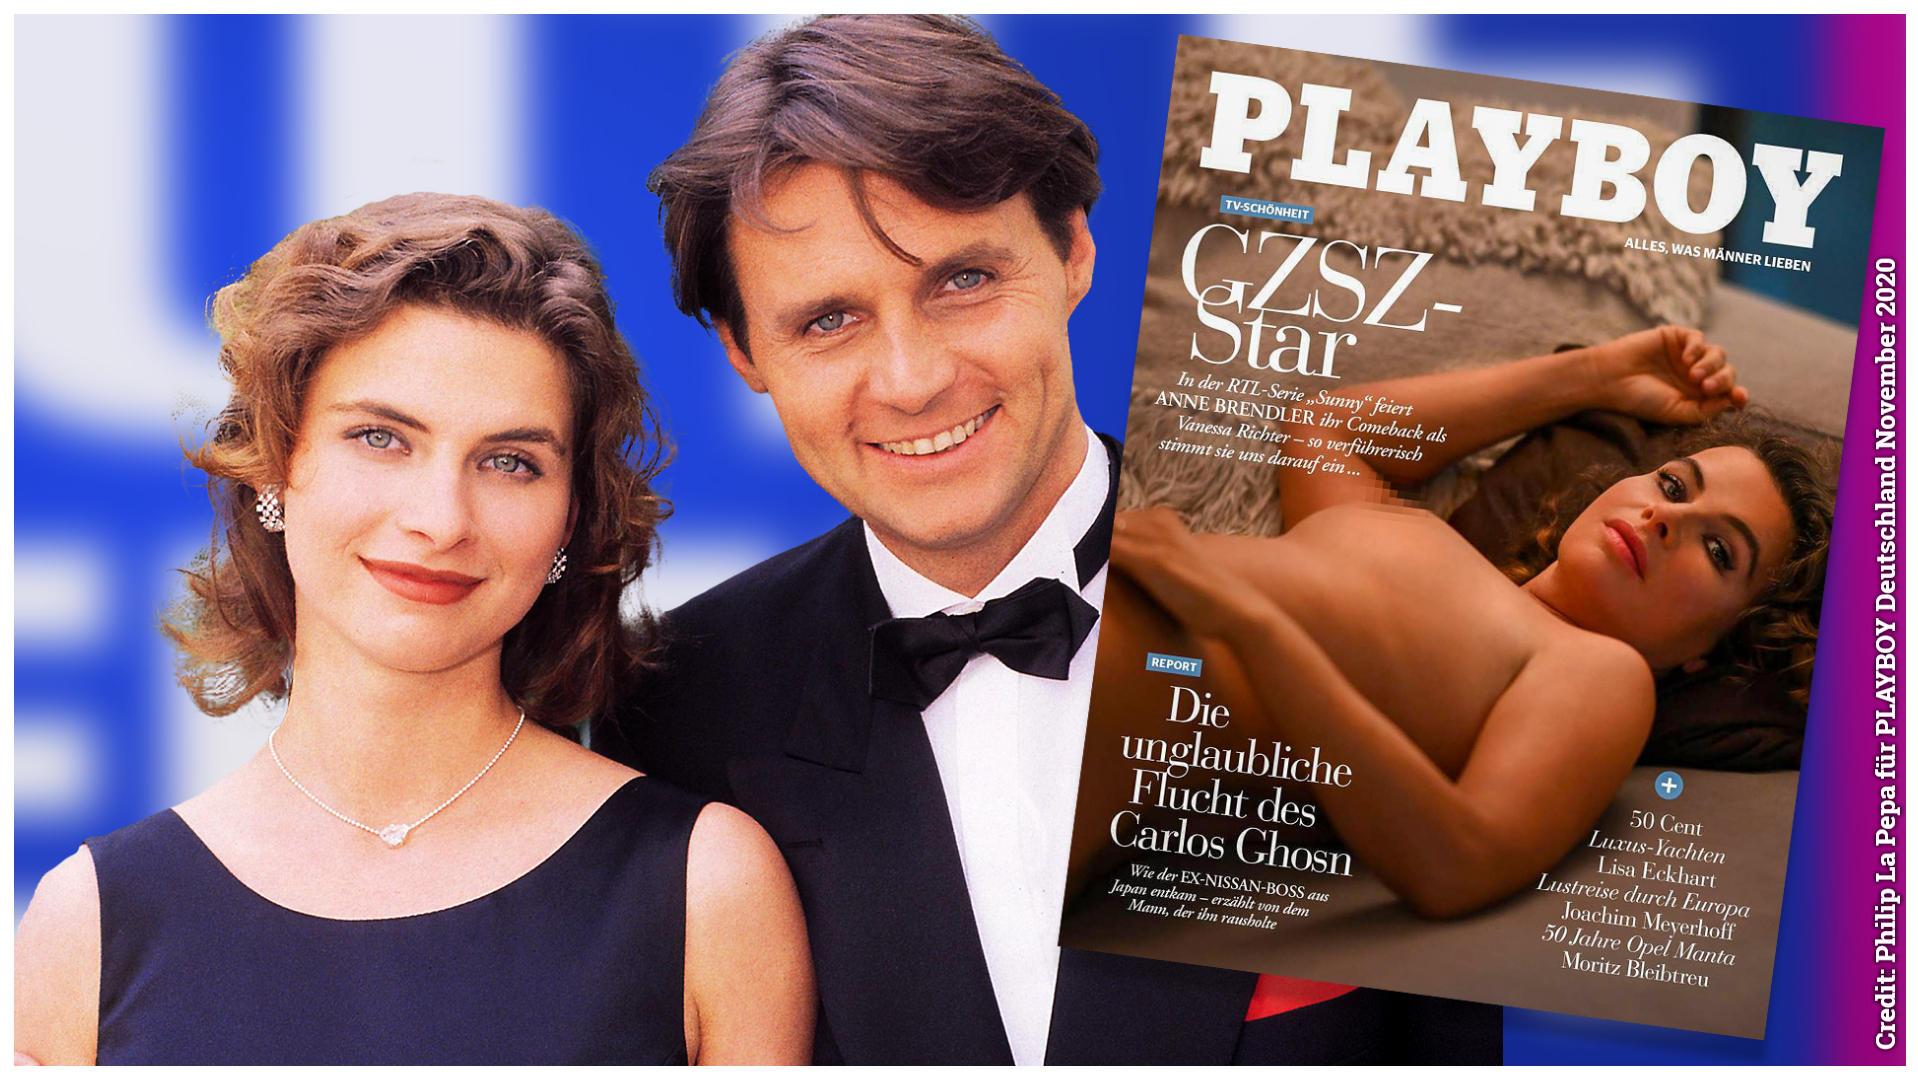 GZSZ-Star Anne Brendler nackt im PLAYBOY   Promivipnews.com